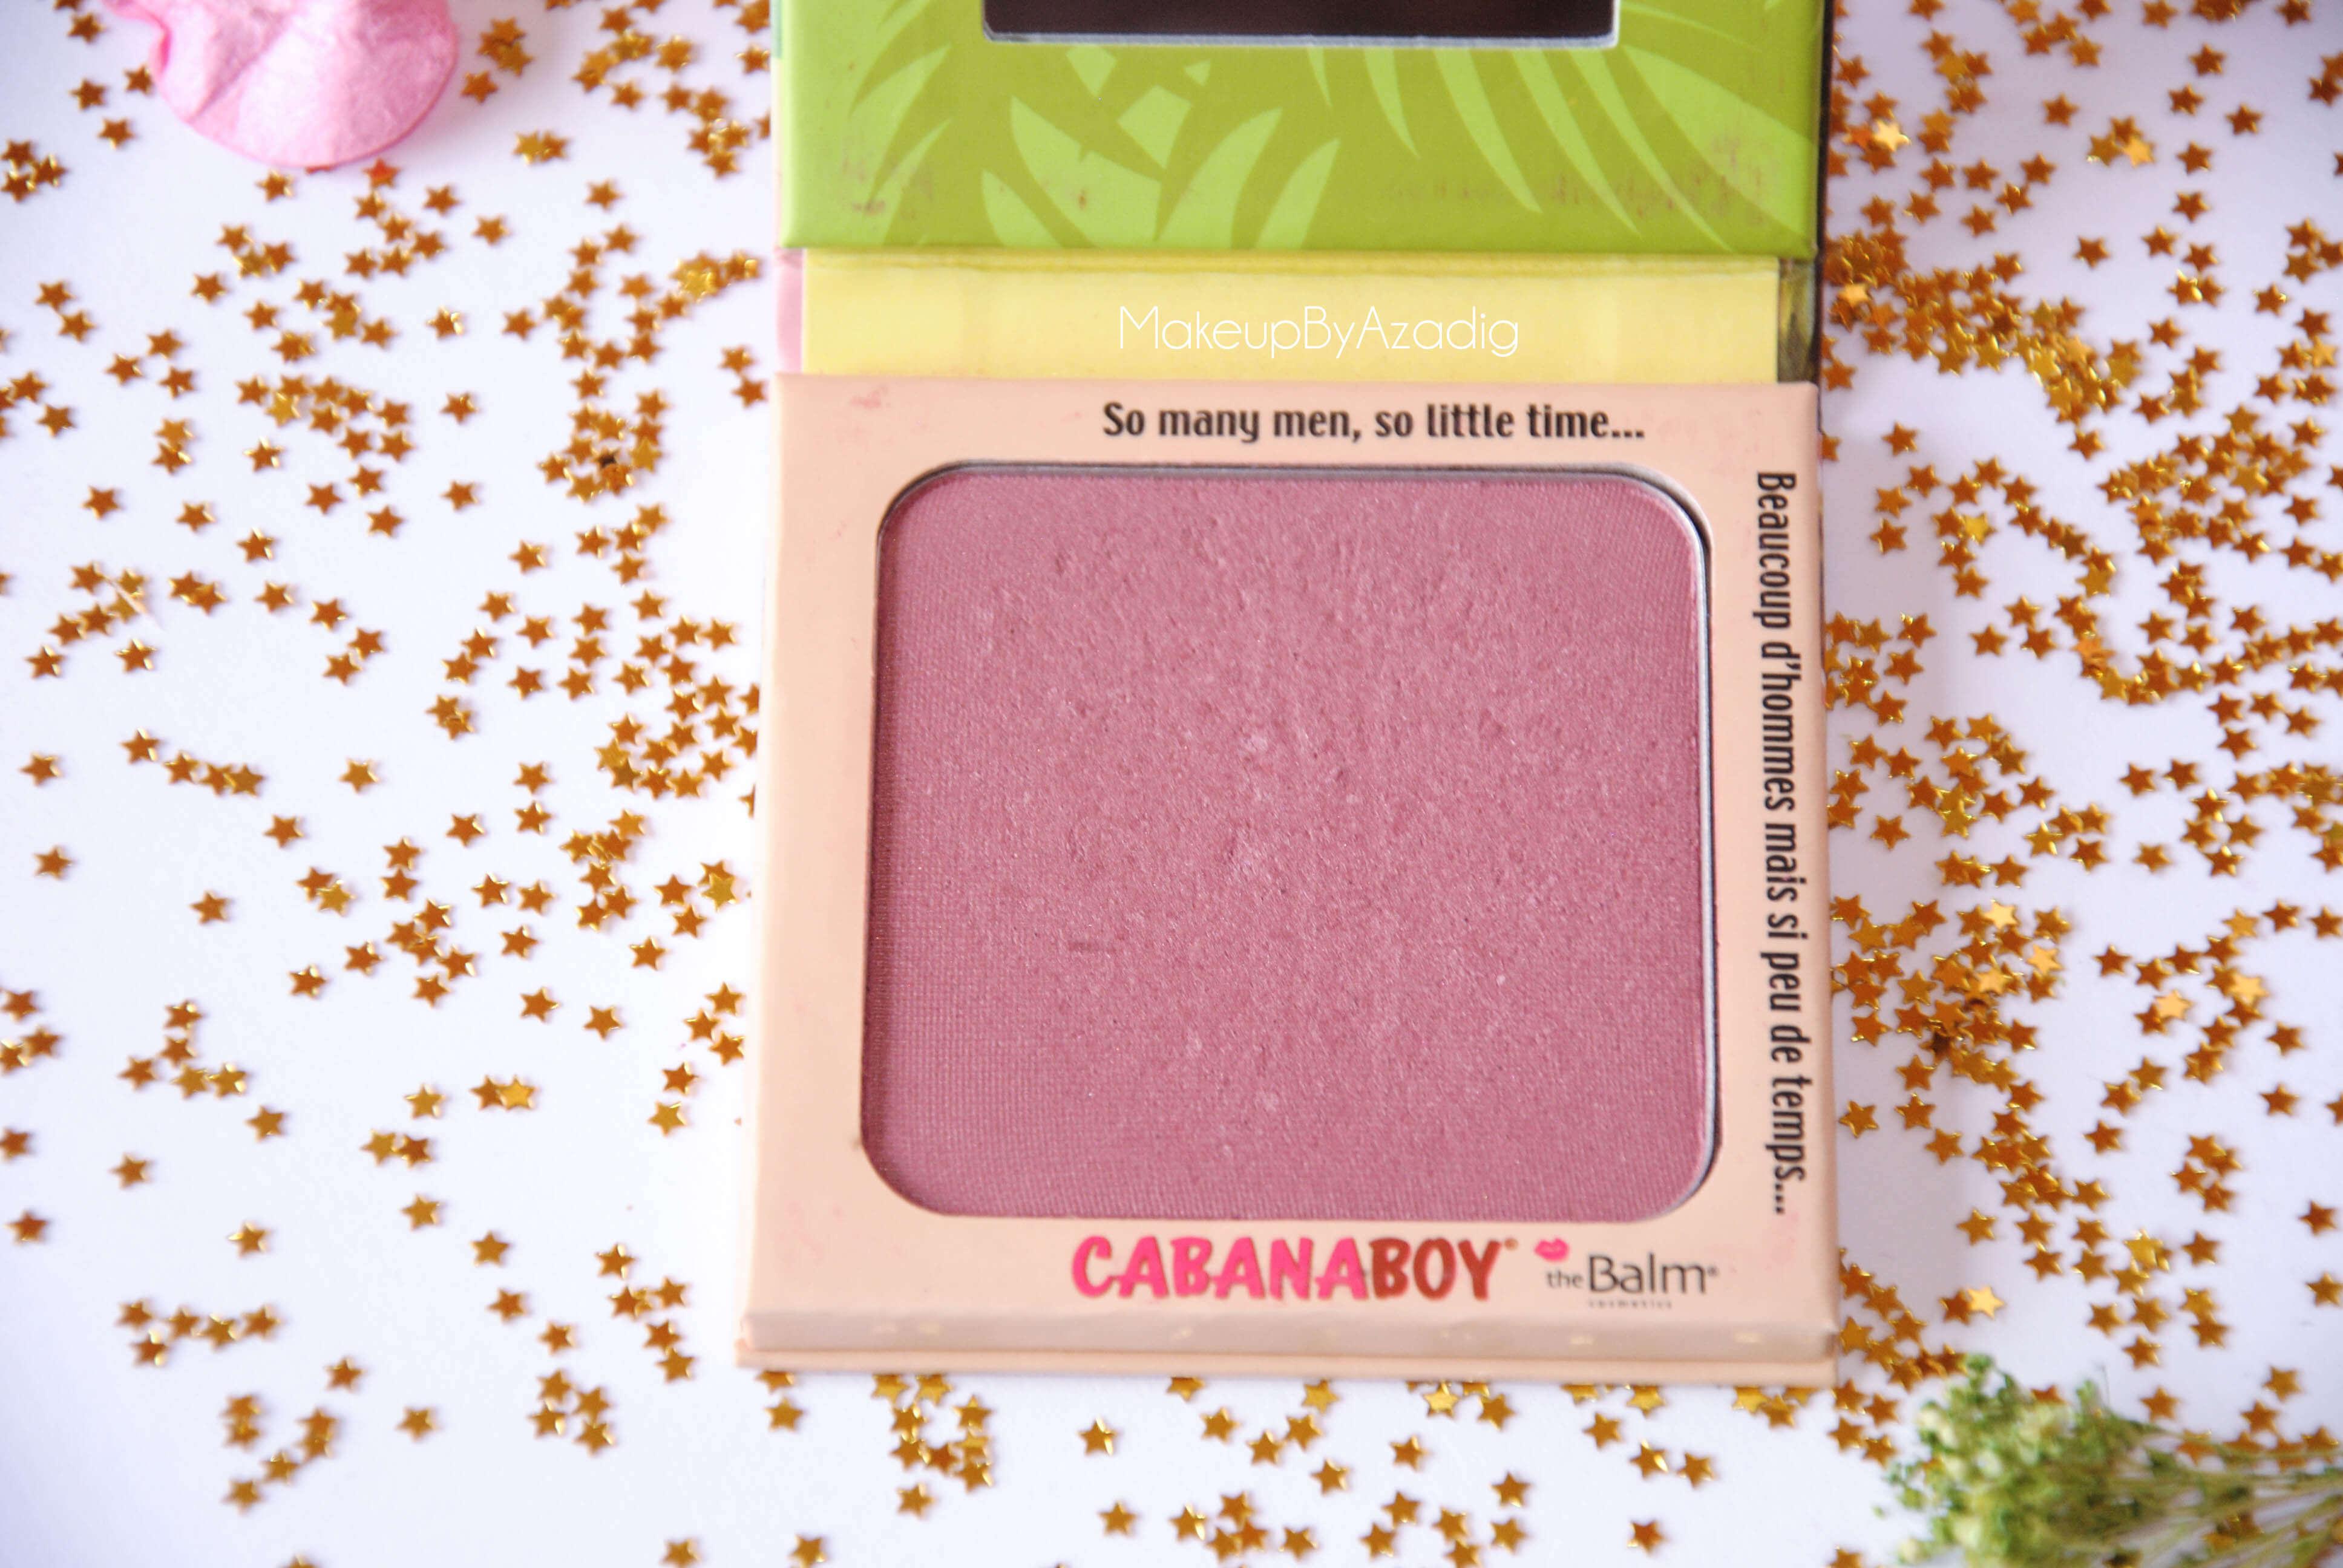 cabanaboy-the balm-blush rose fonce-monoprix-beaute privee-the beautyst-makeupbyazadig-pink